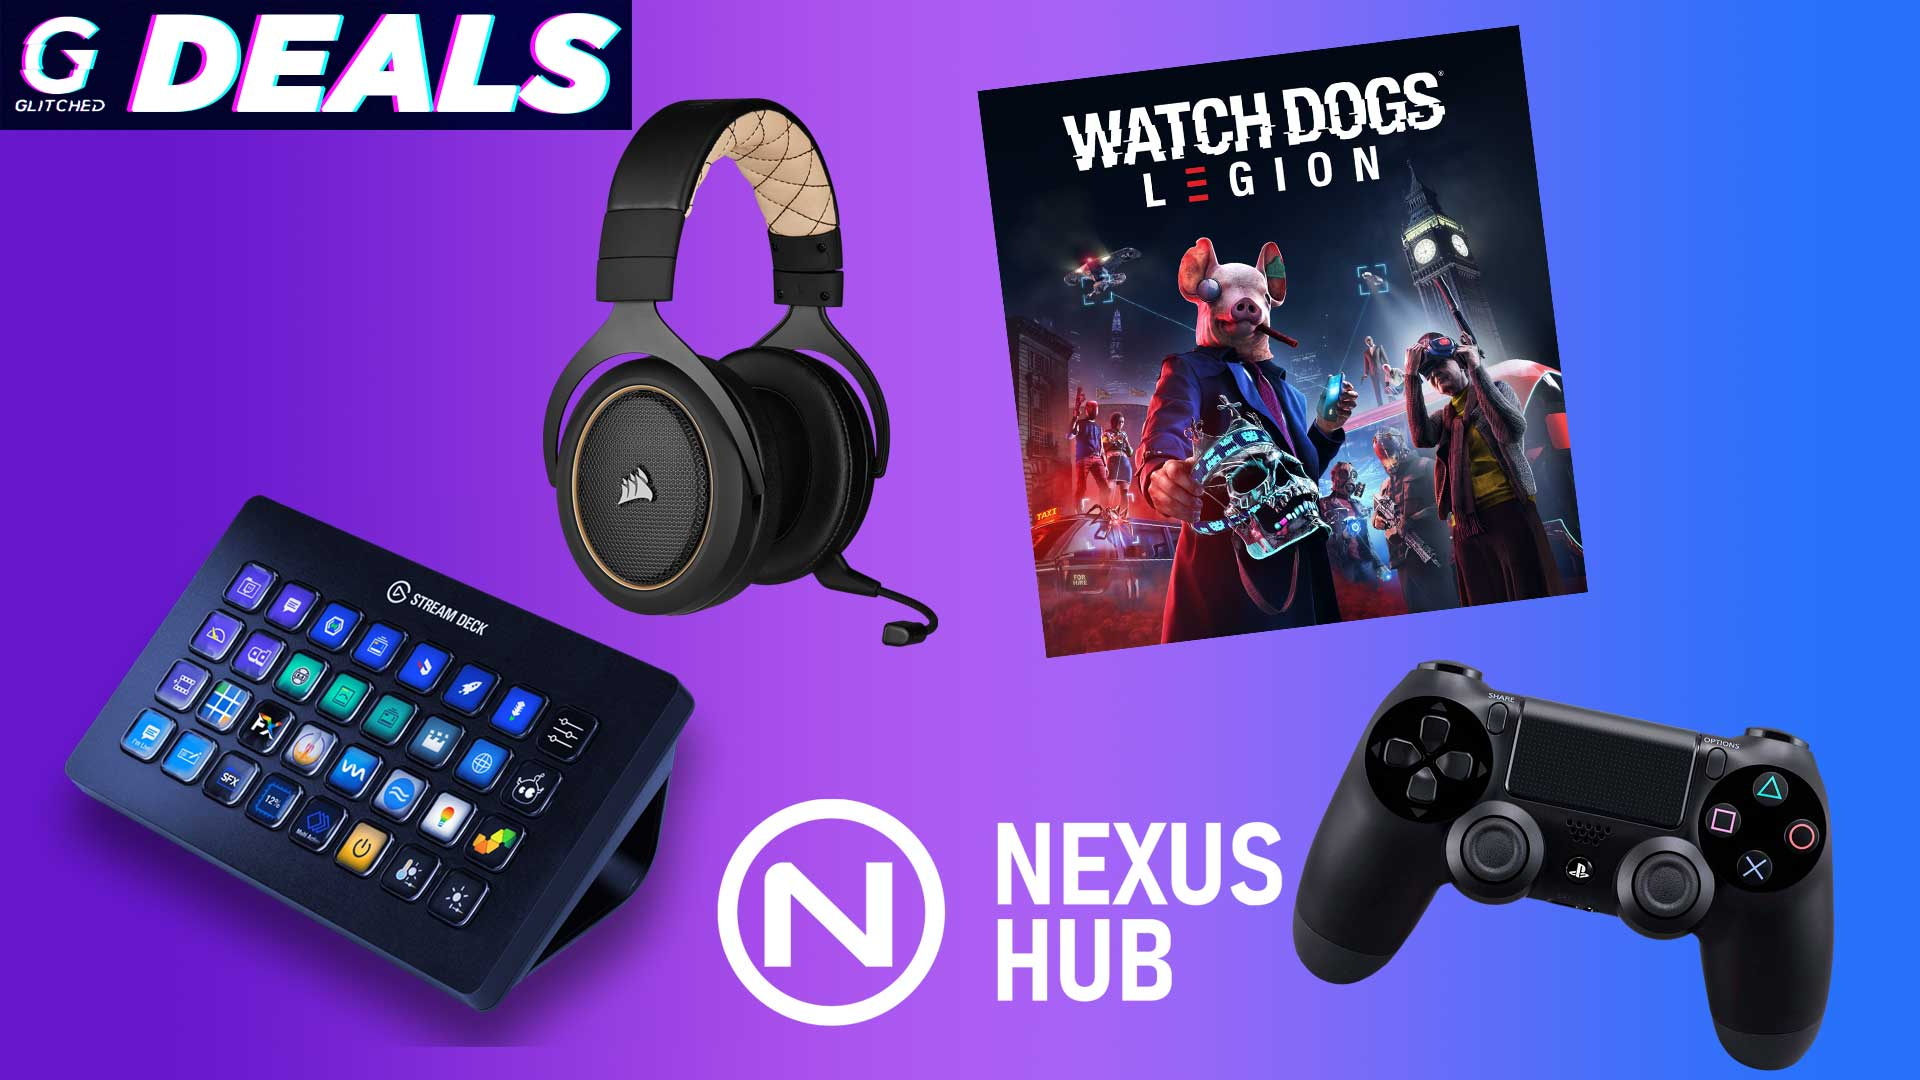 Nexus Hub Black Friday Specials Revealed